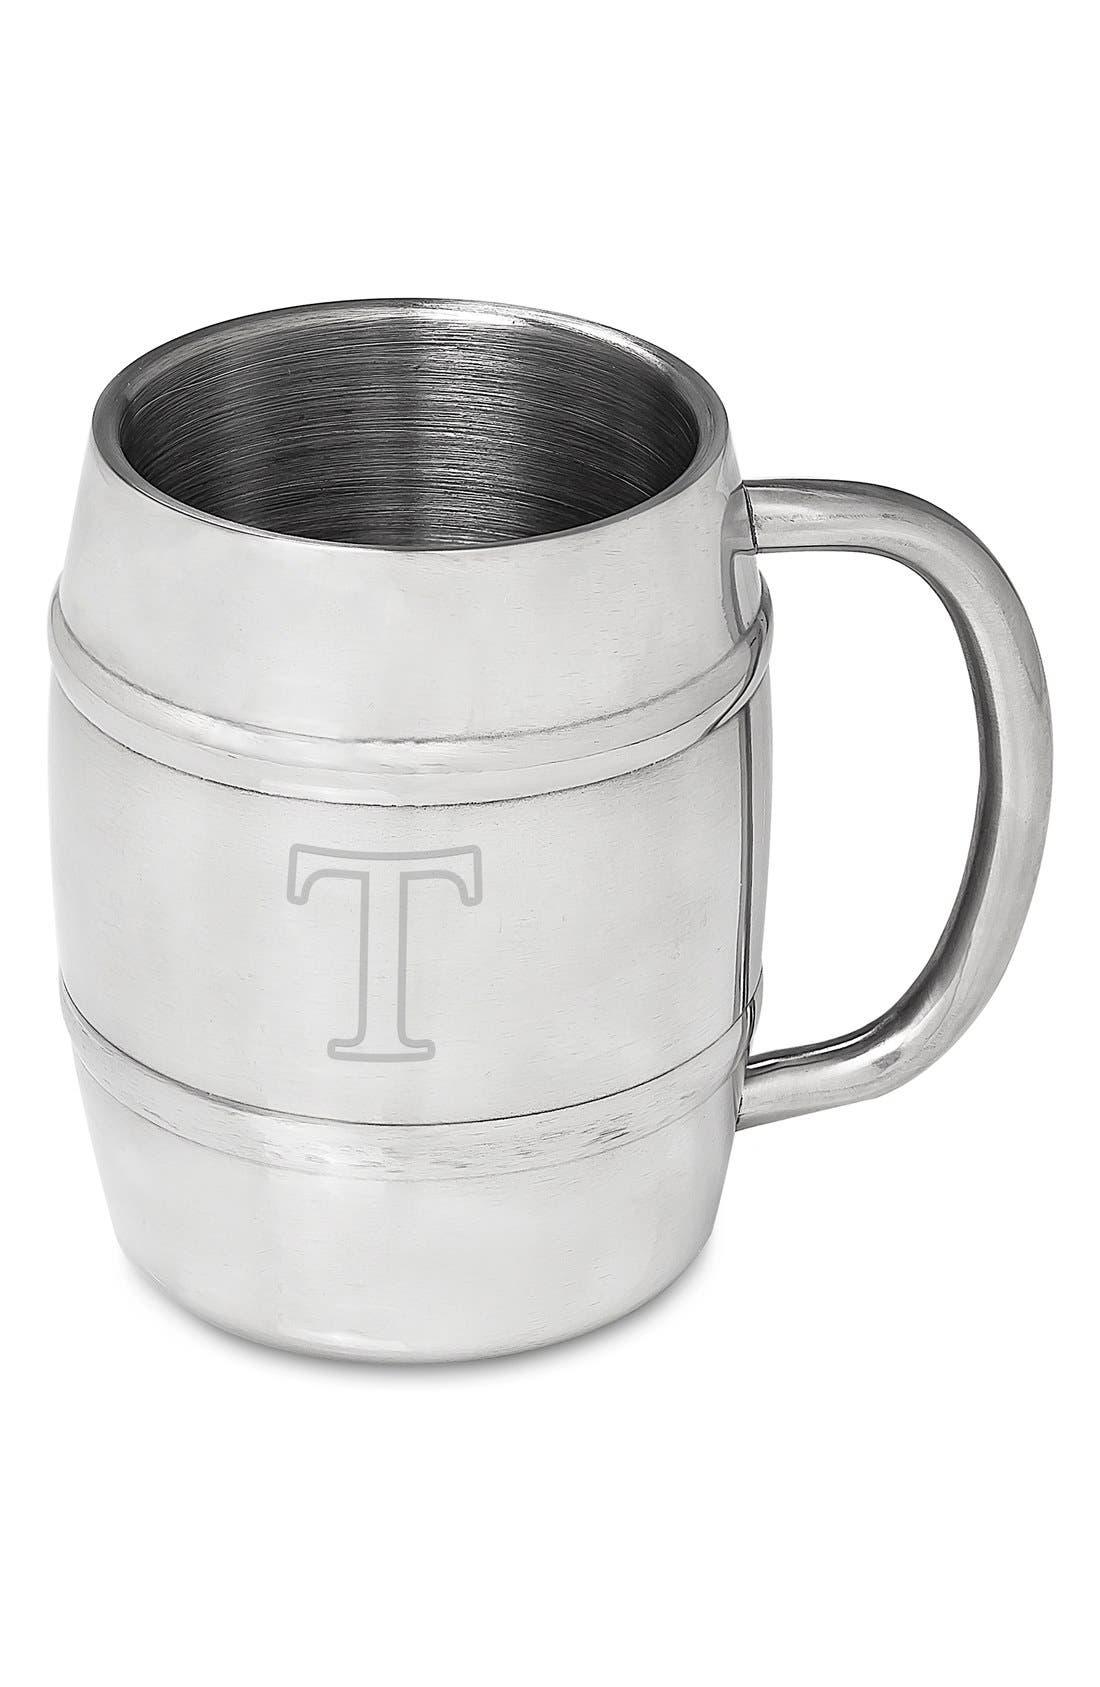 Monogram Stainless Steel Keg Mug,                         Main,                         color, T